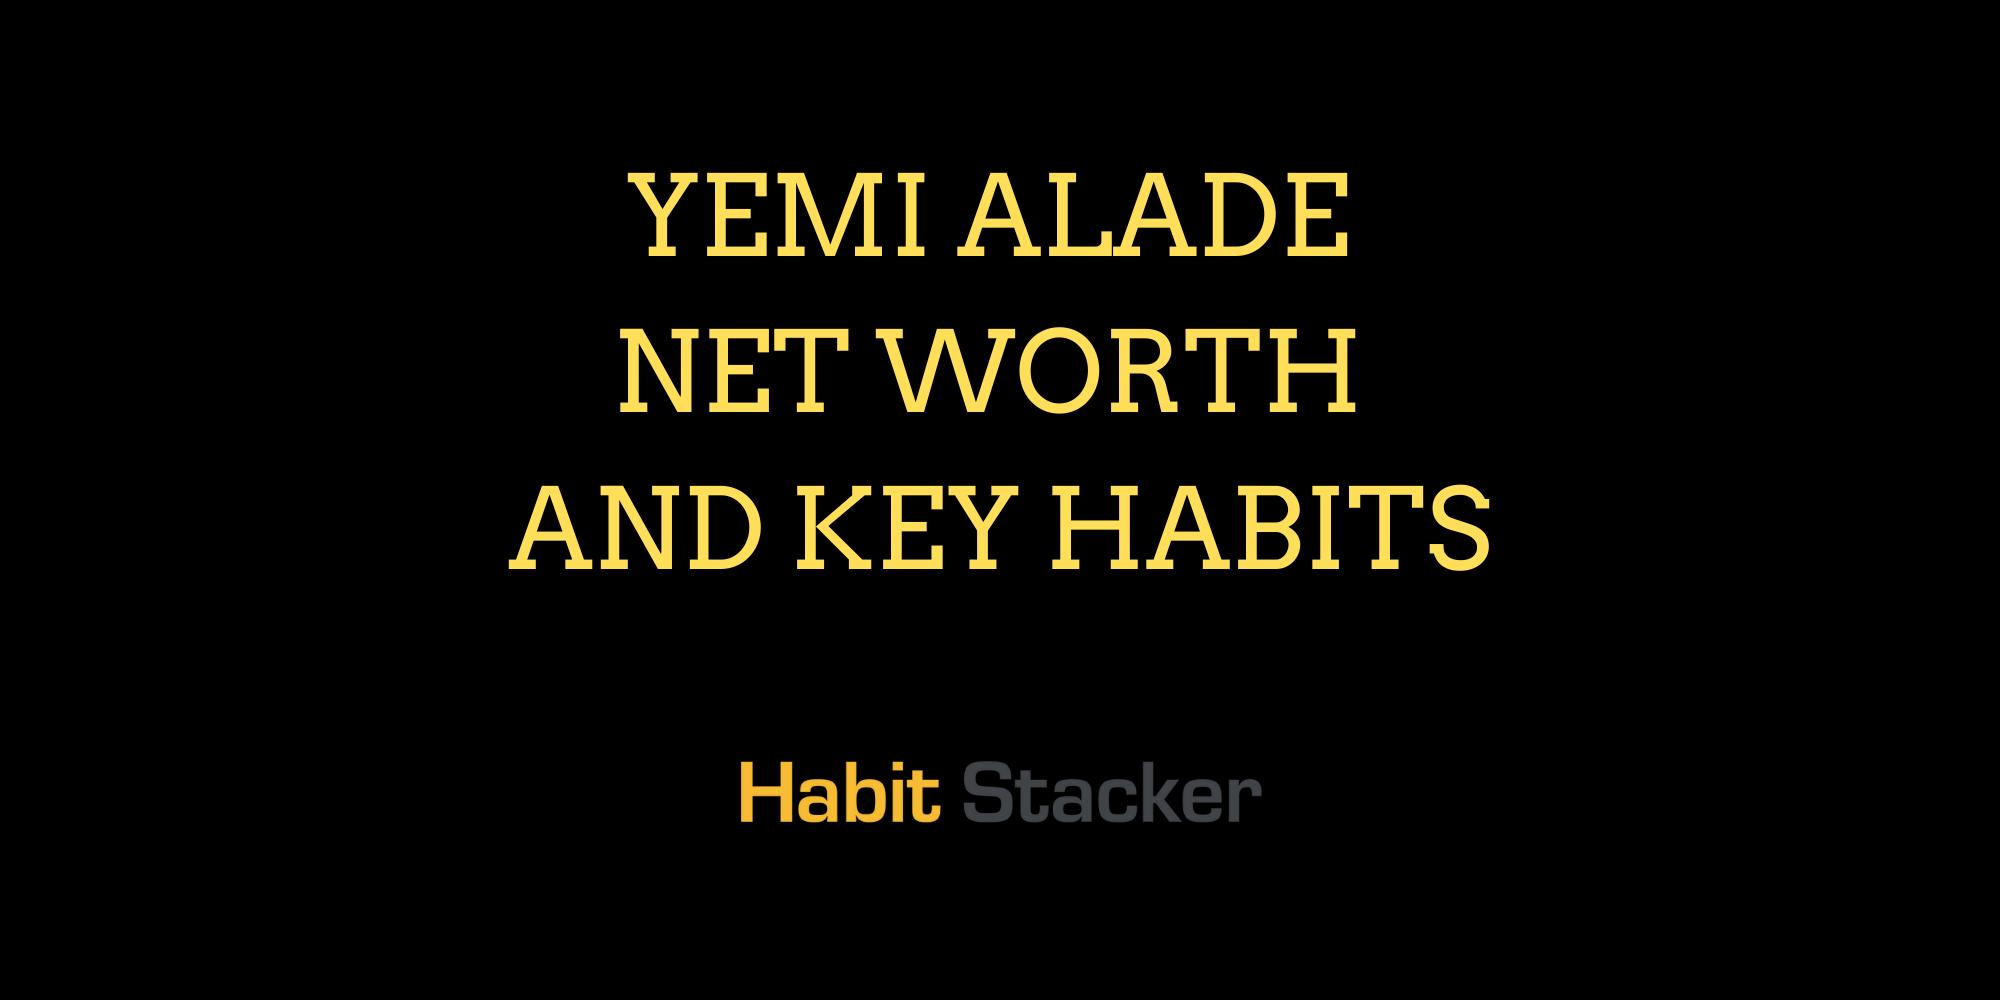 Yemi Alade Net Worth and Key Habits